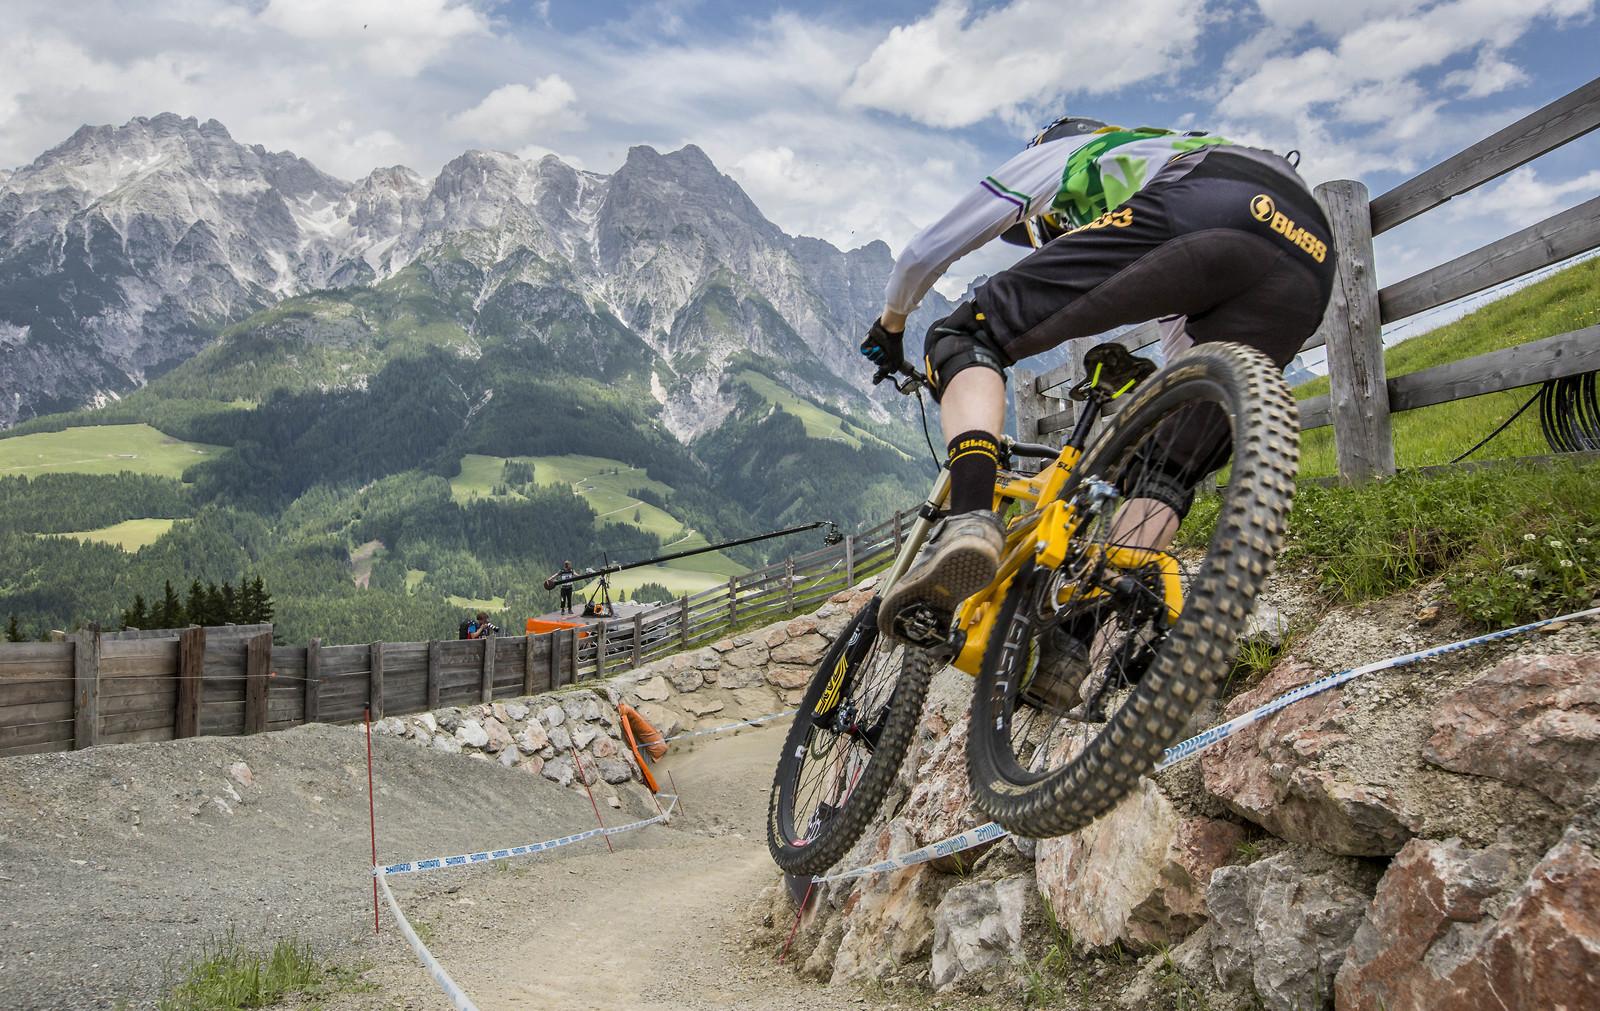 jacob dixon leogang wc - phunkt.com - Mountain Biking Pictures - Vital MTB